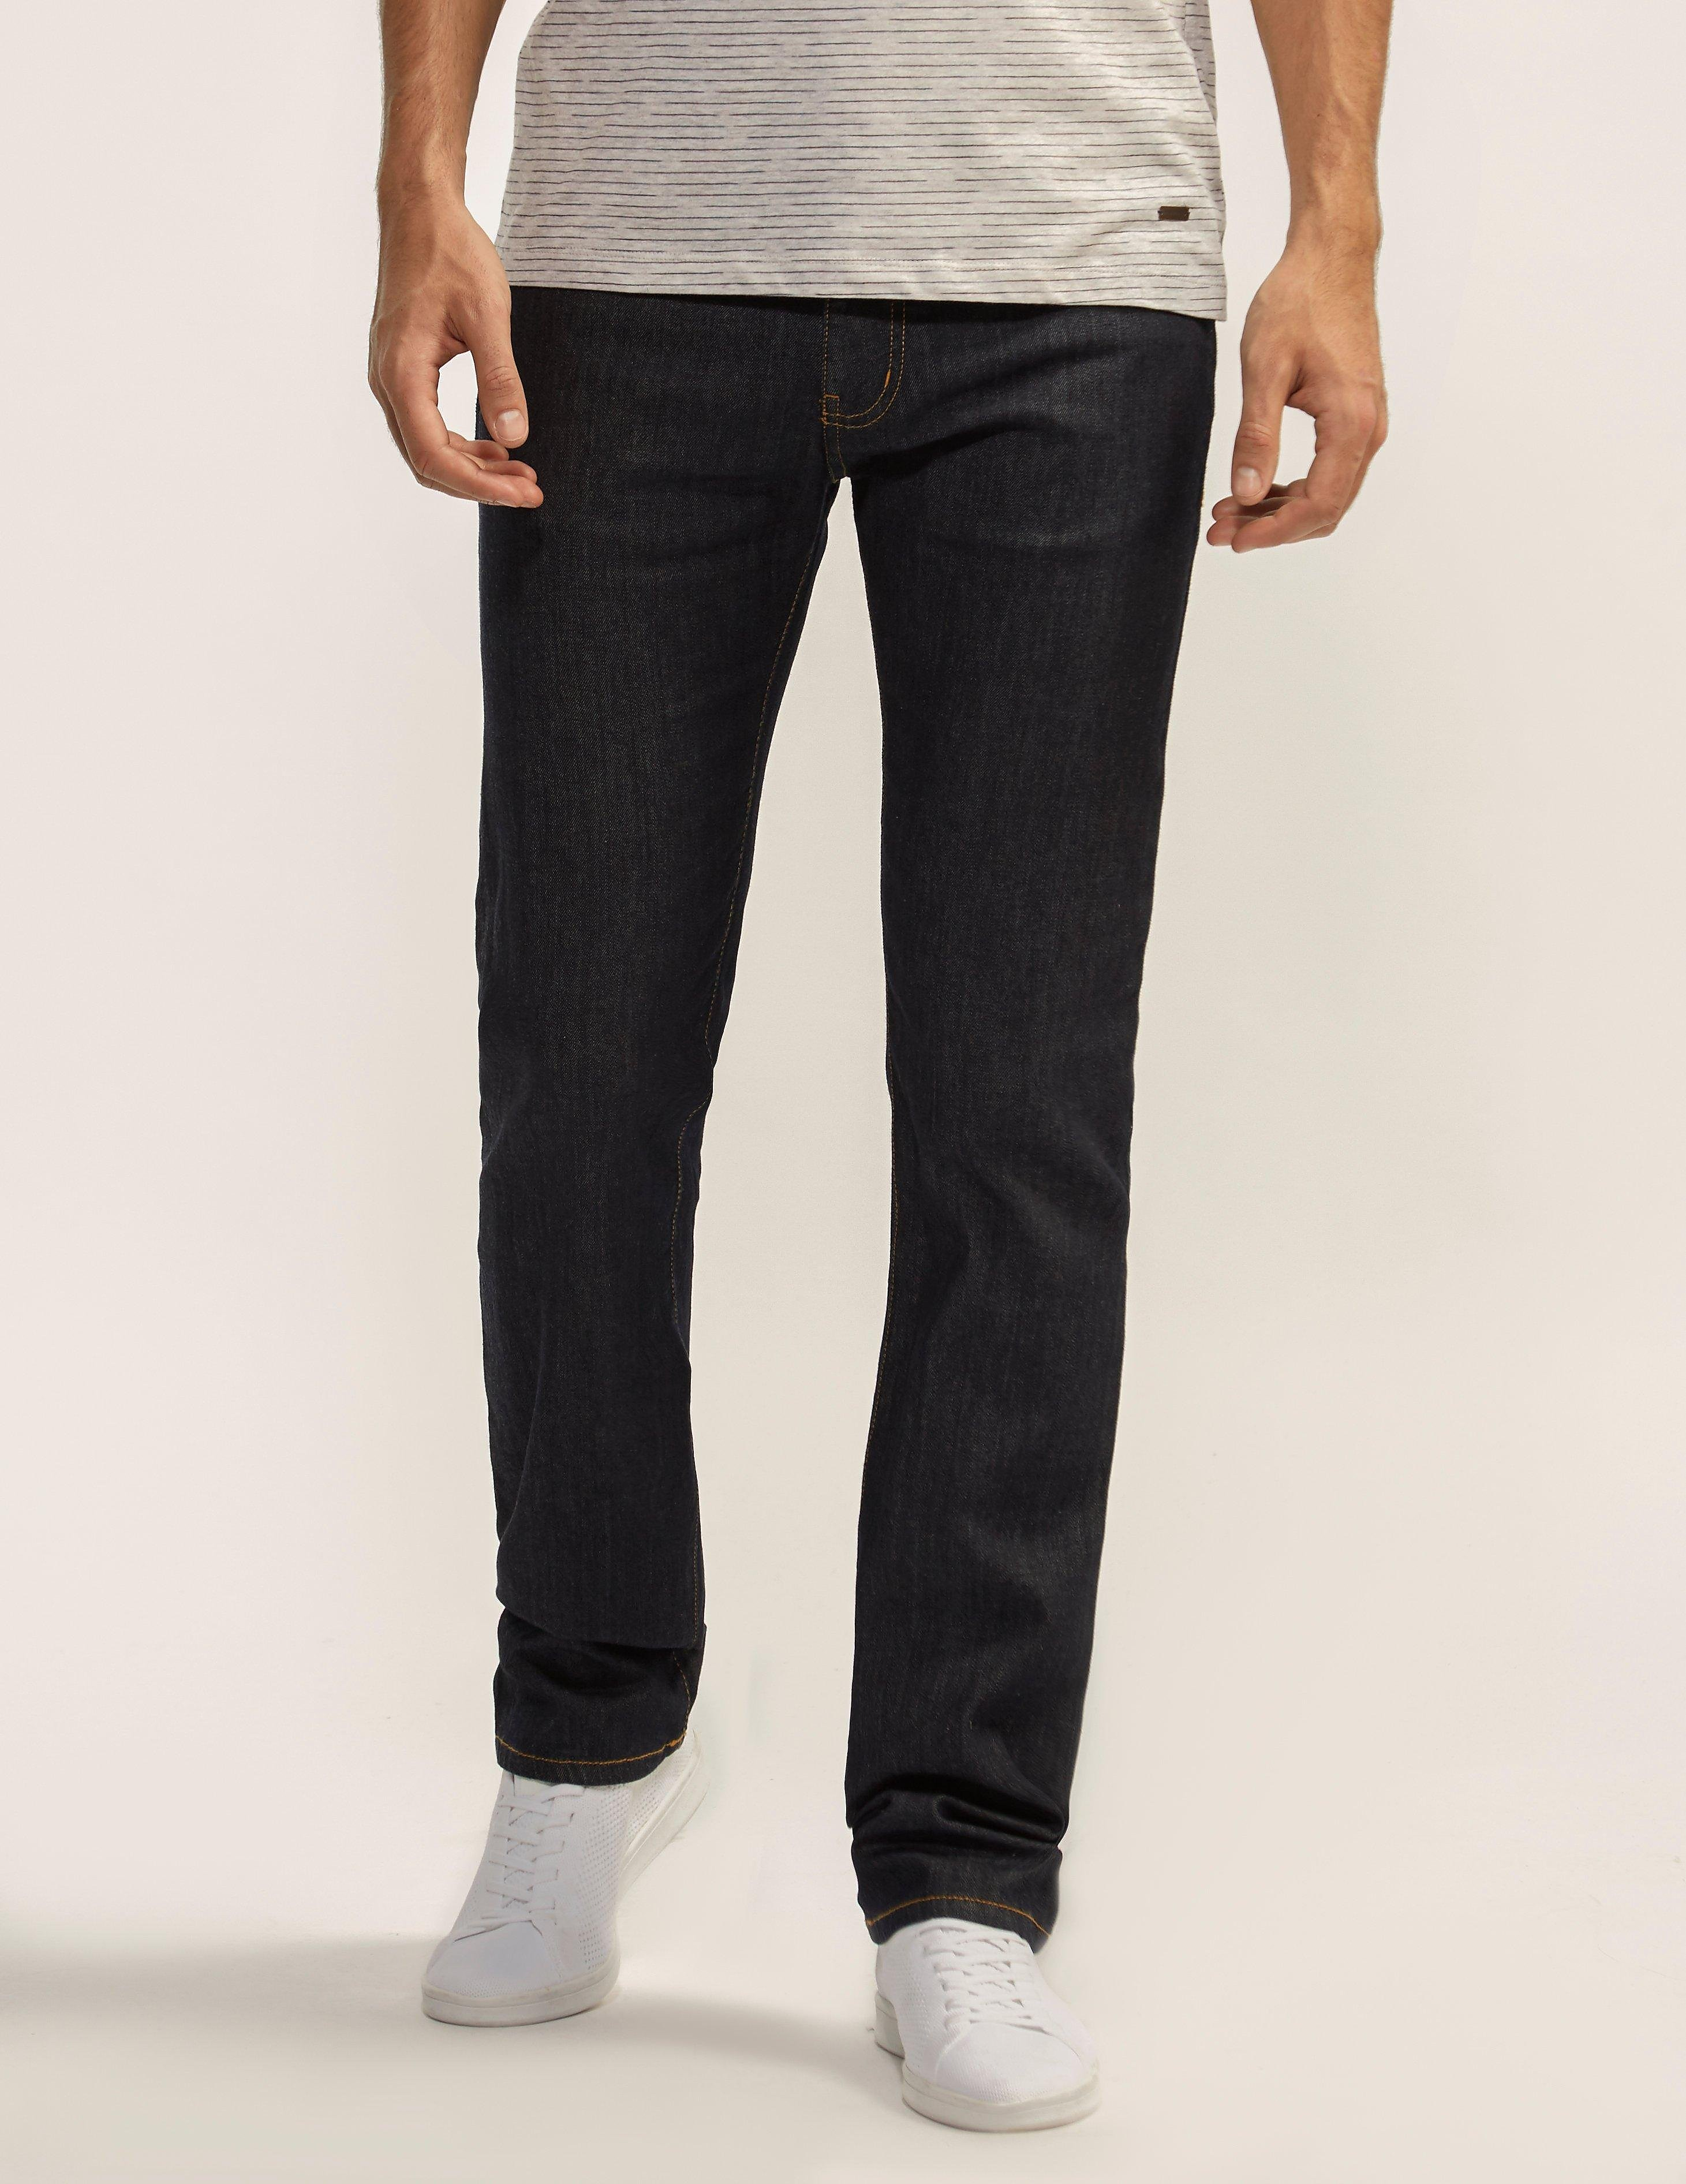 Armani Jeans J45 Slim Fit Jean - Long Leg